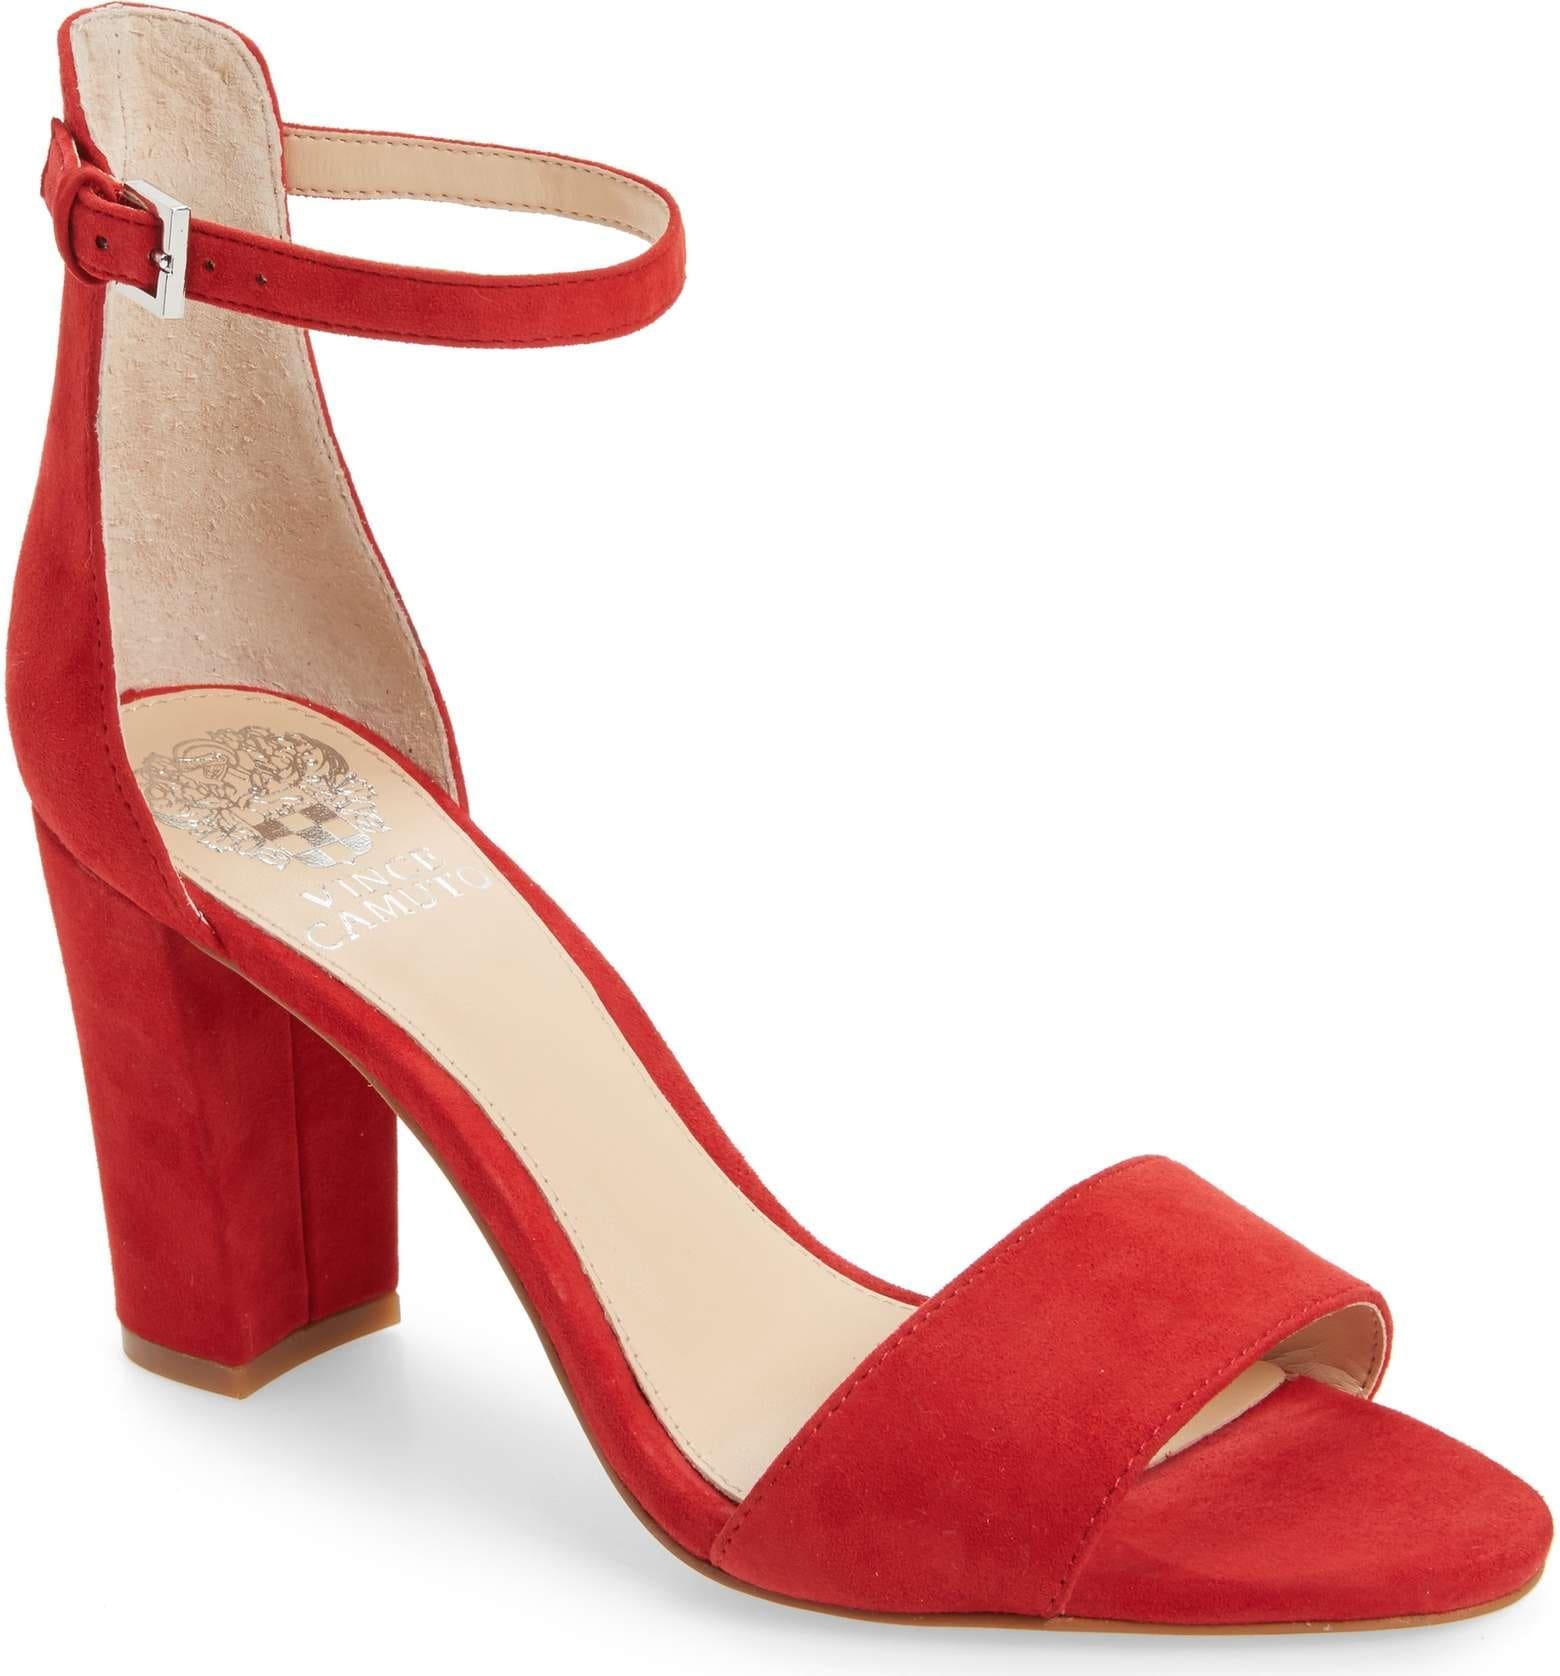 Vince Camuto's Corlina Ankle Strap Sandal